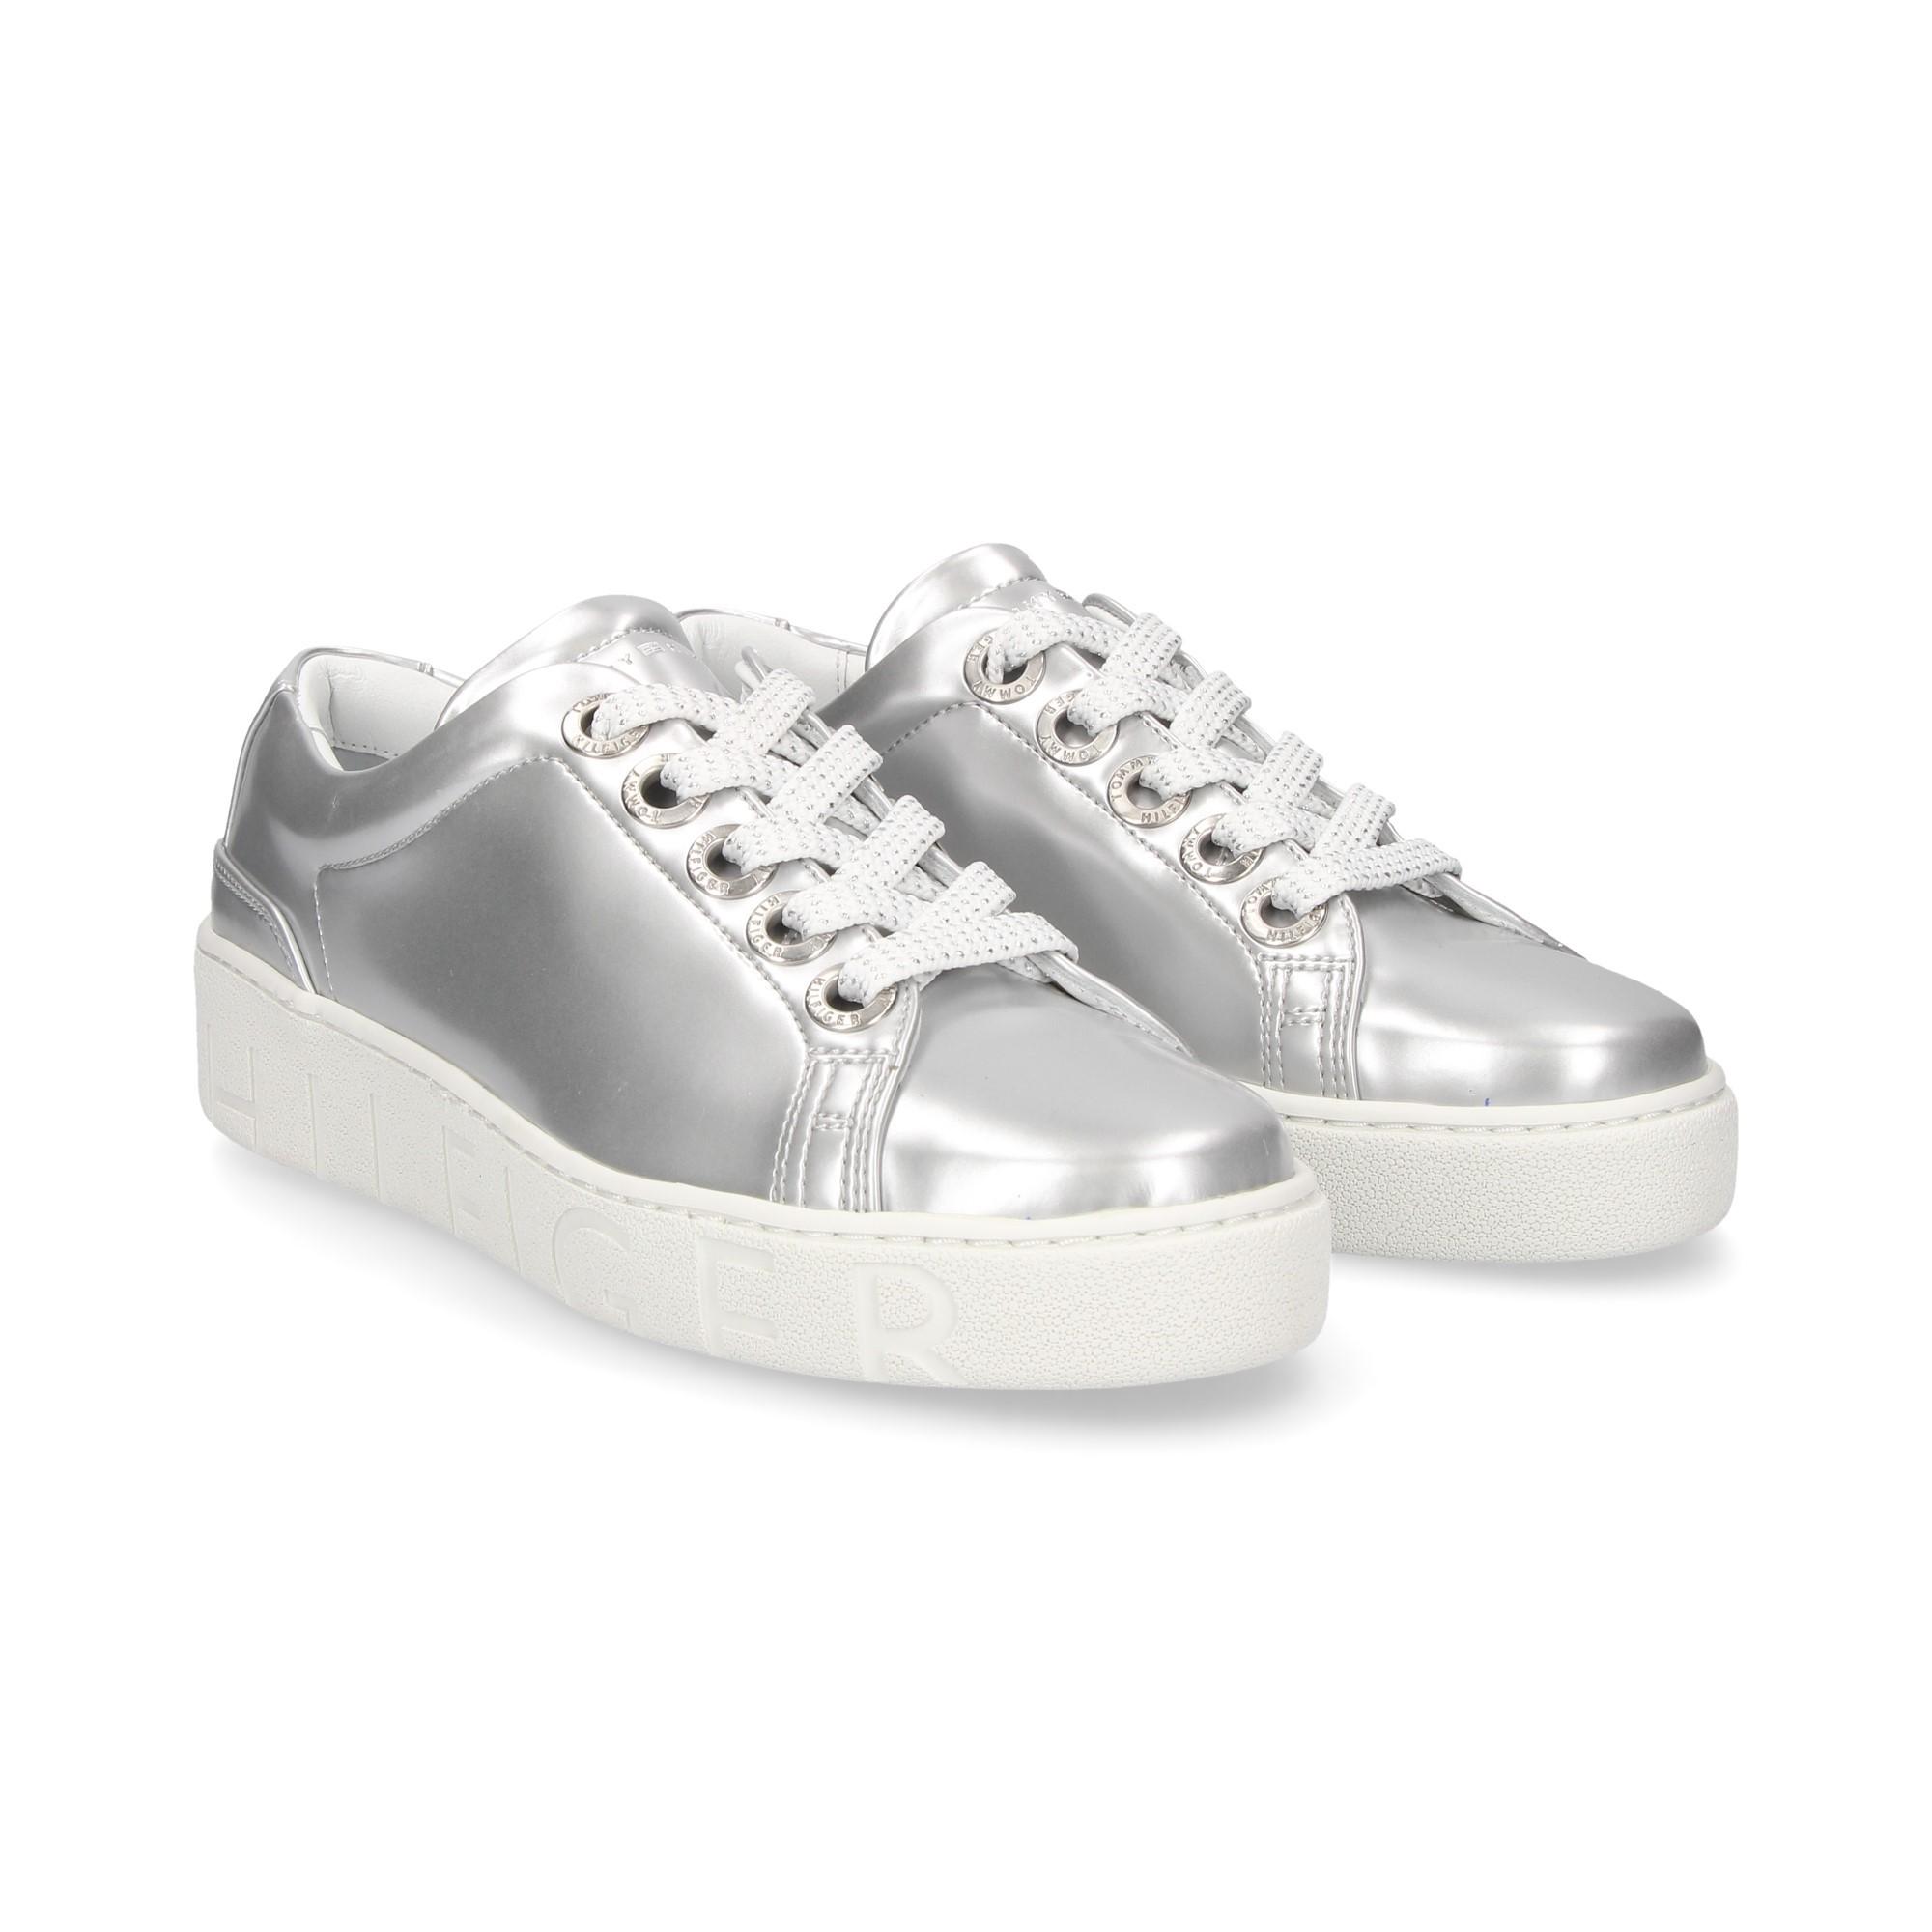 a57dccec78db1e TOMMY HILFIGER Women s Sneakers FW03478000 PLATA